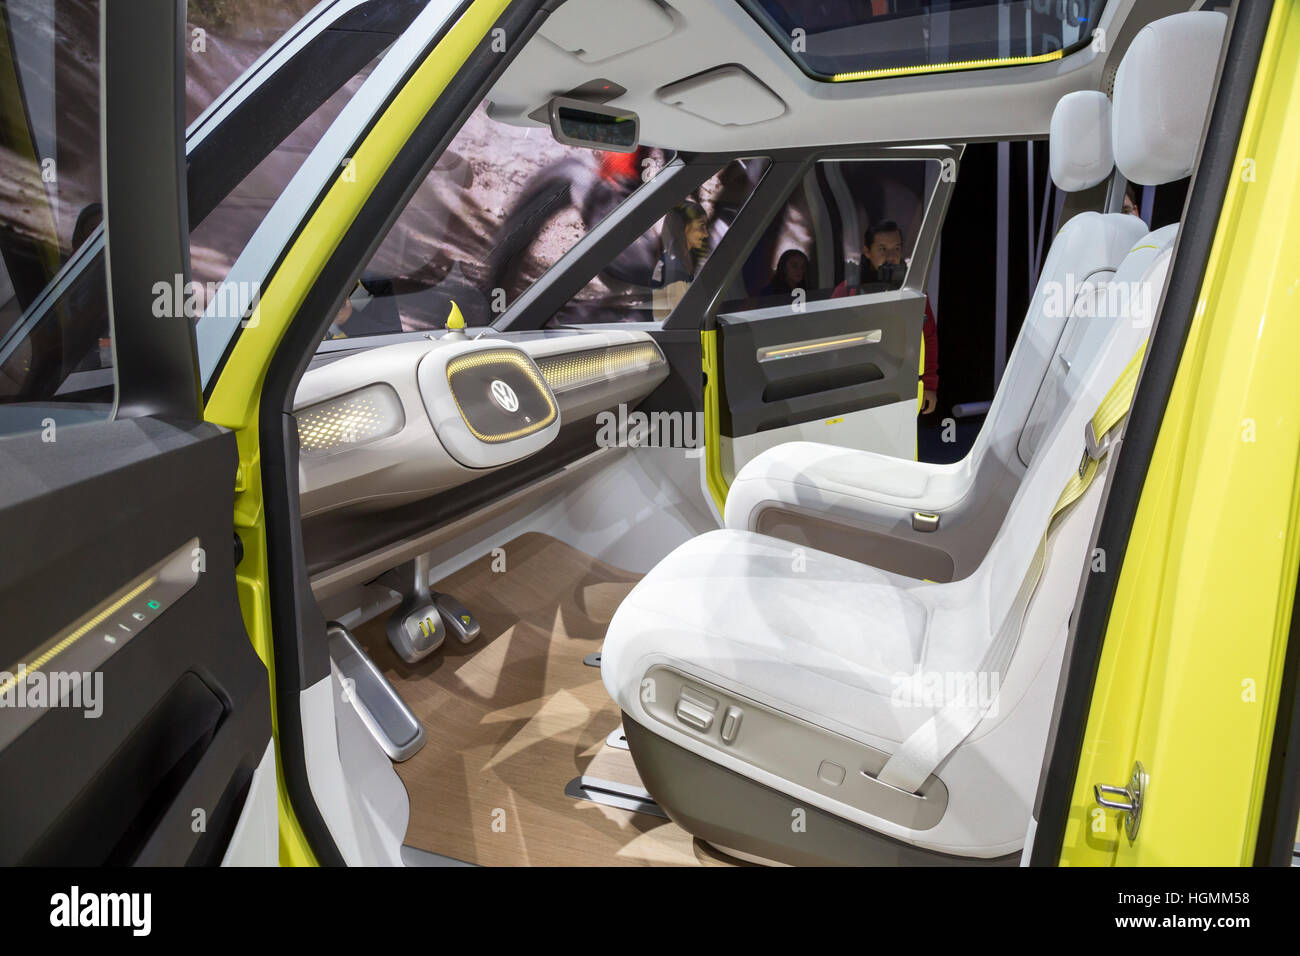 Detroit, Michigan - Detroit, Michigan USA - 10 January 2017 - vehicle on display at the North American International - Stock Image